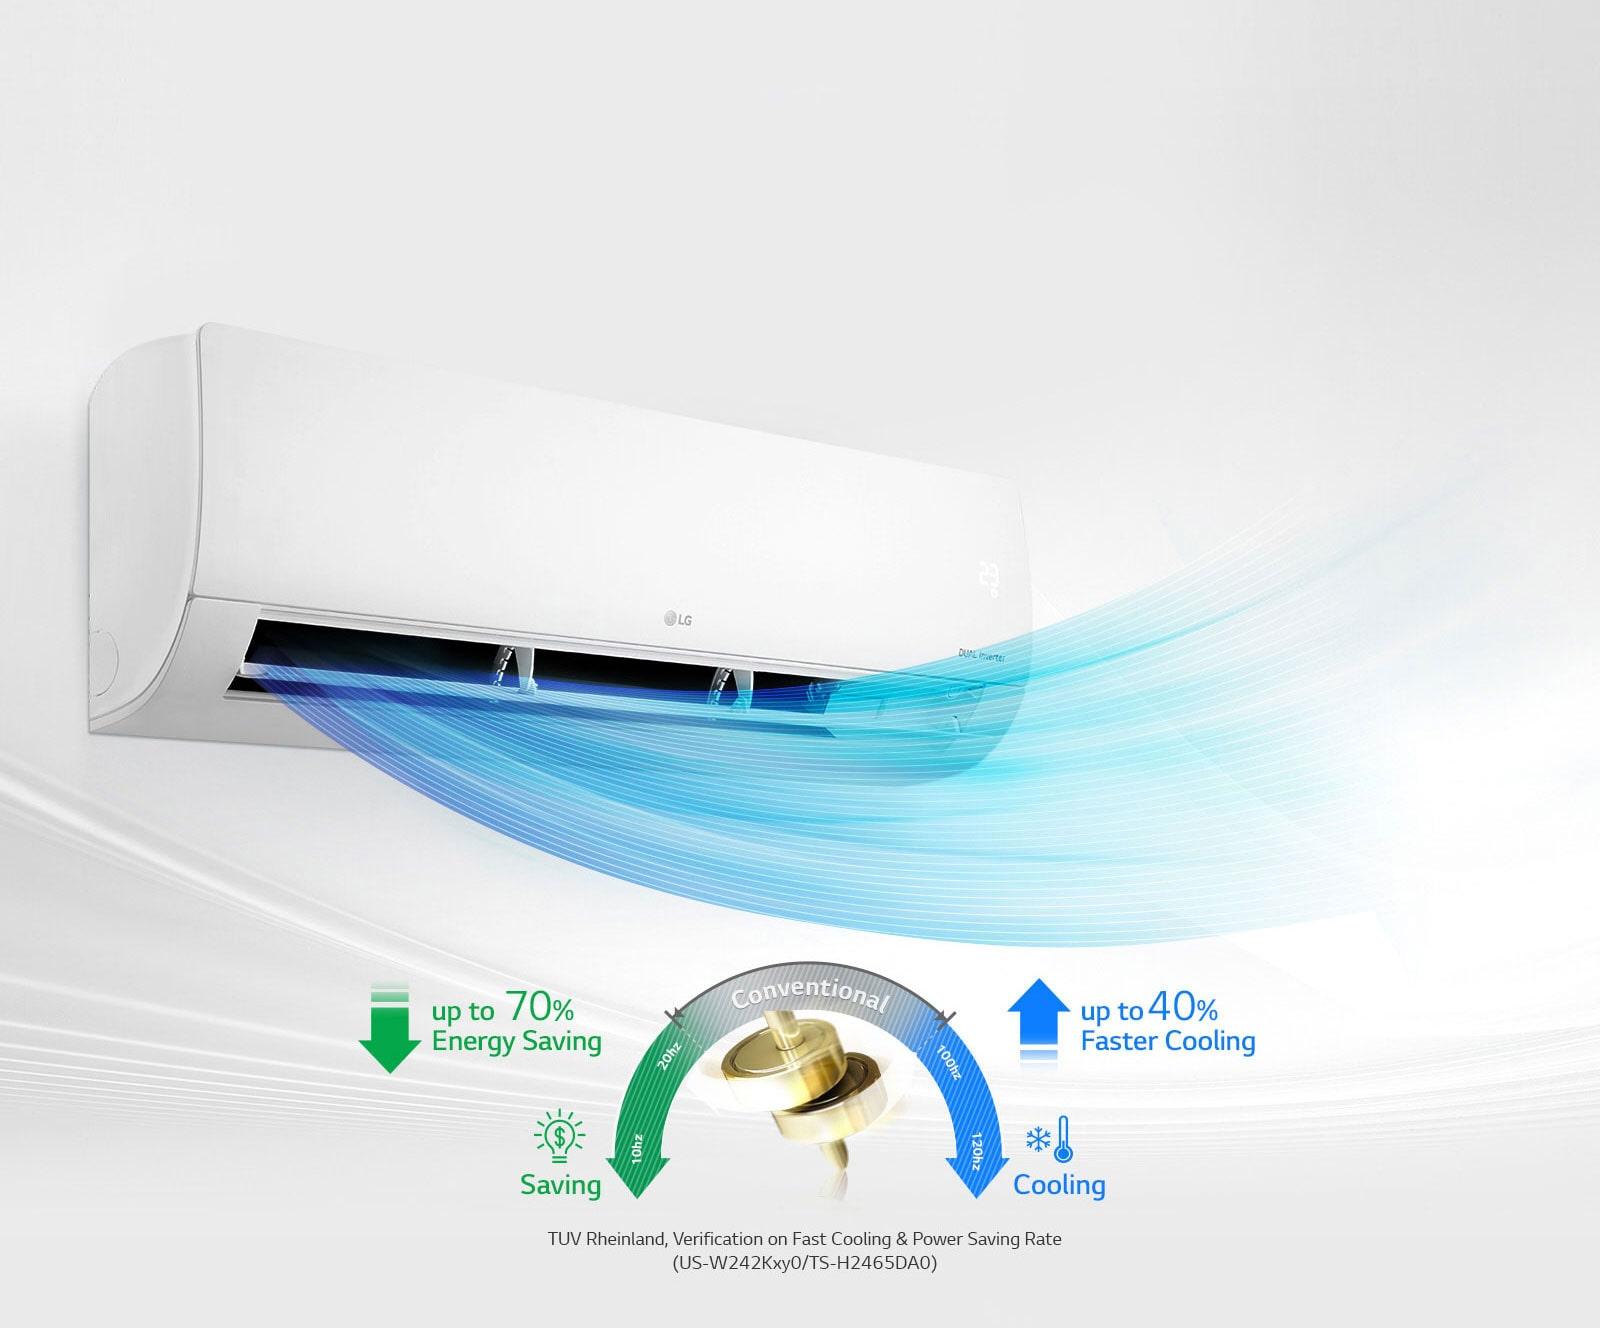 S4-Q18KL3QD_03_Fast_Cooling_&_Energy_Saving_14032019_D